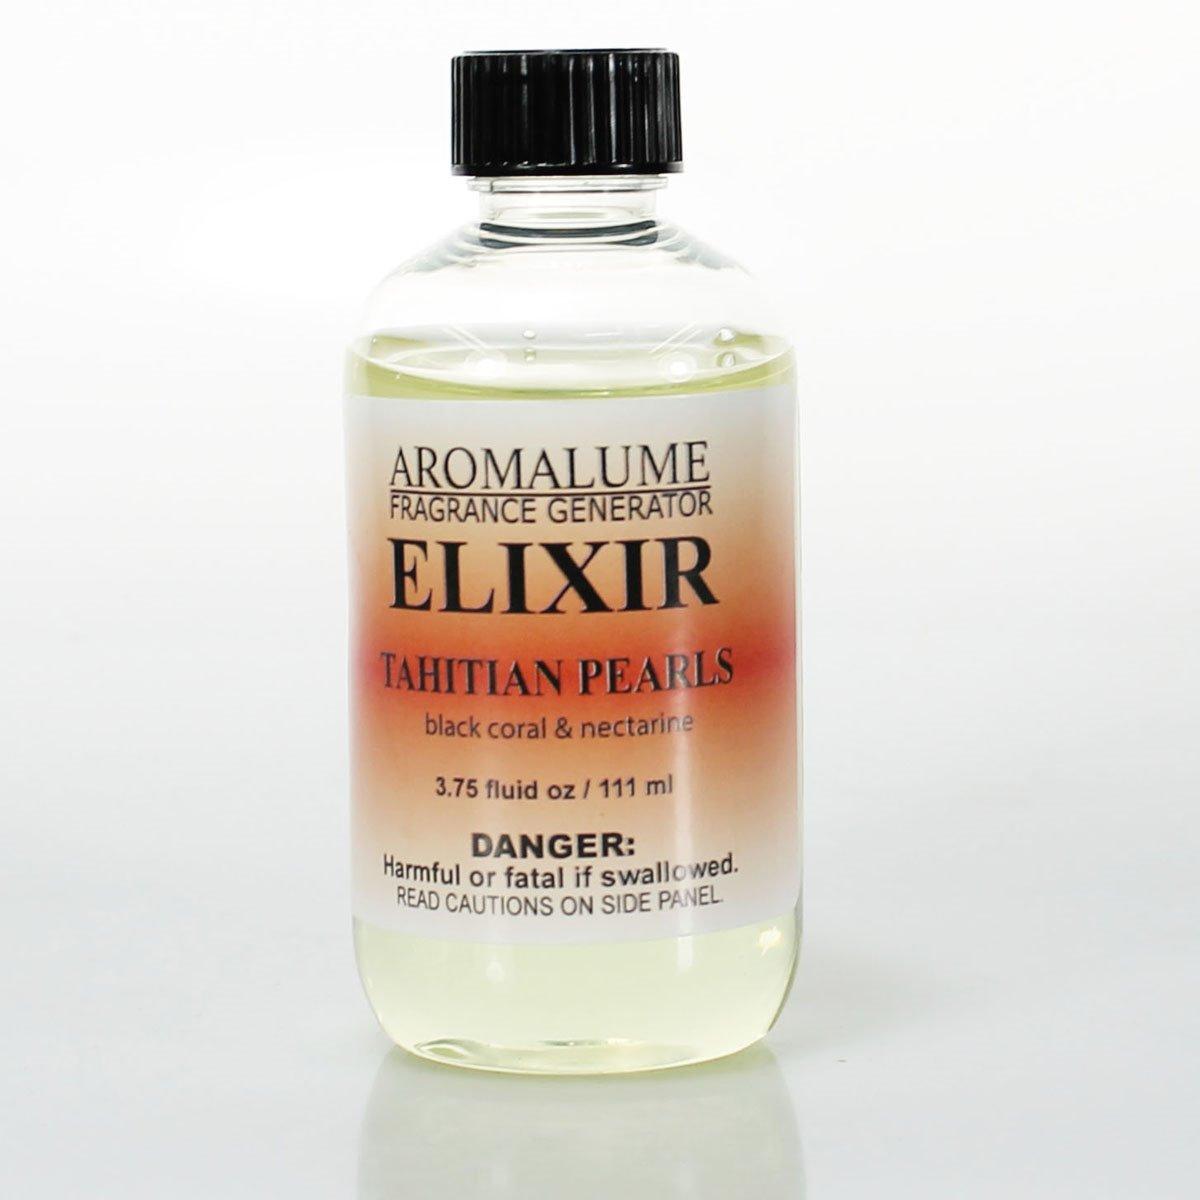 La Tee Da AromaLume Refill Elixir Fragrance Tahitian Pearls